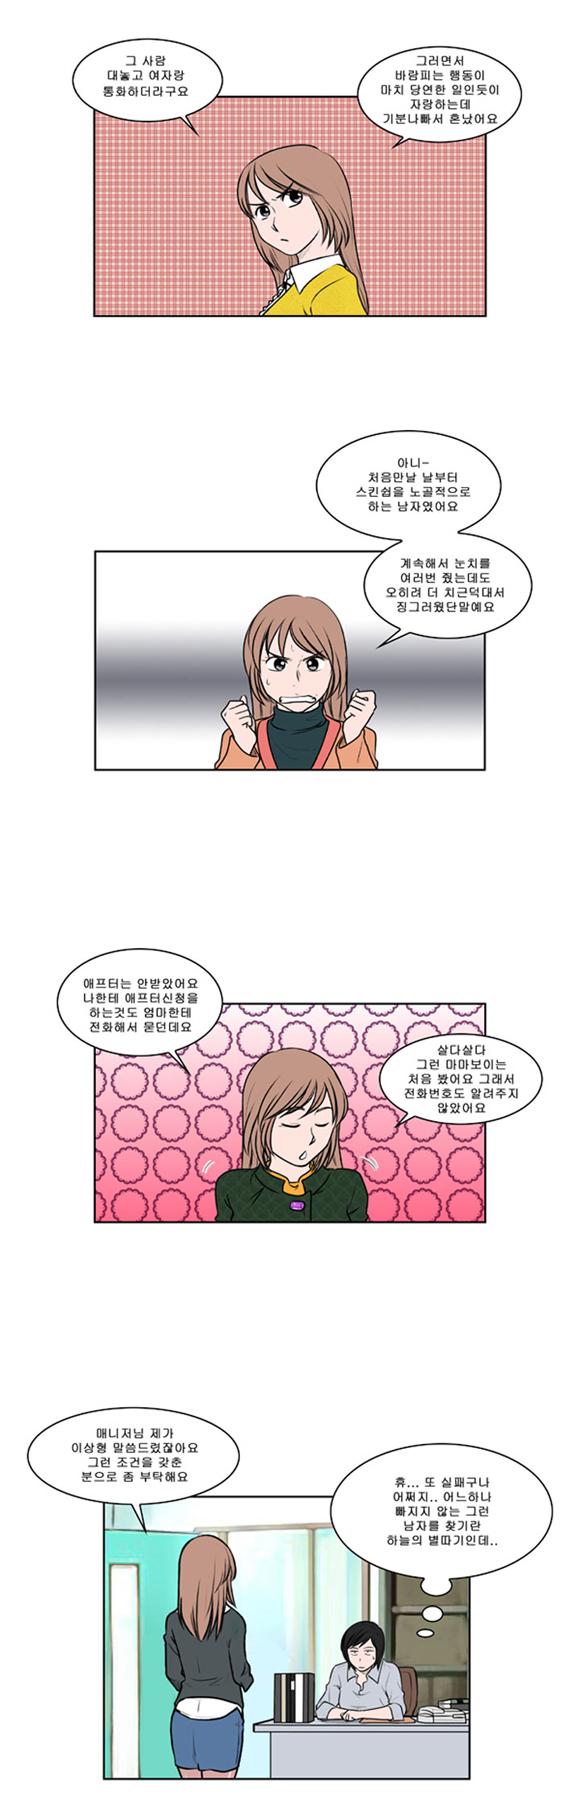 duocartoon_04_01.jpg